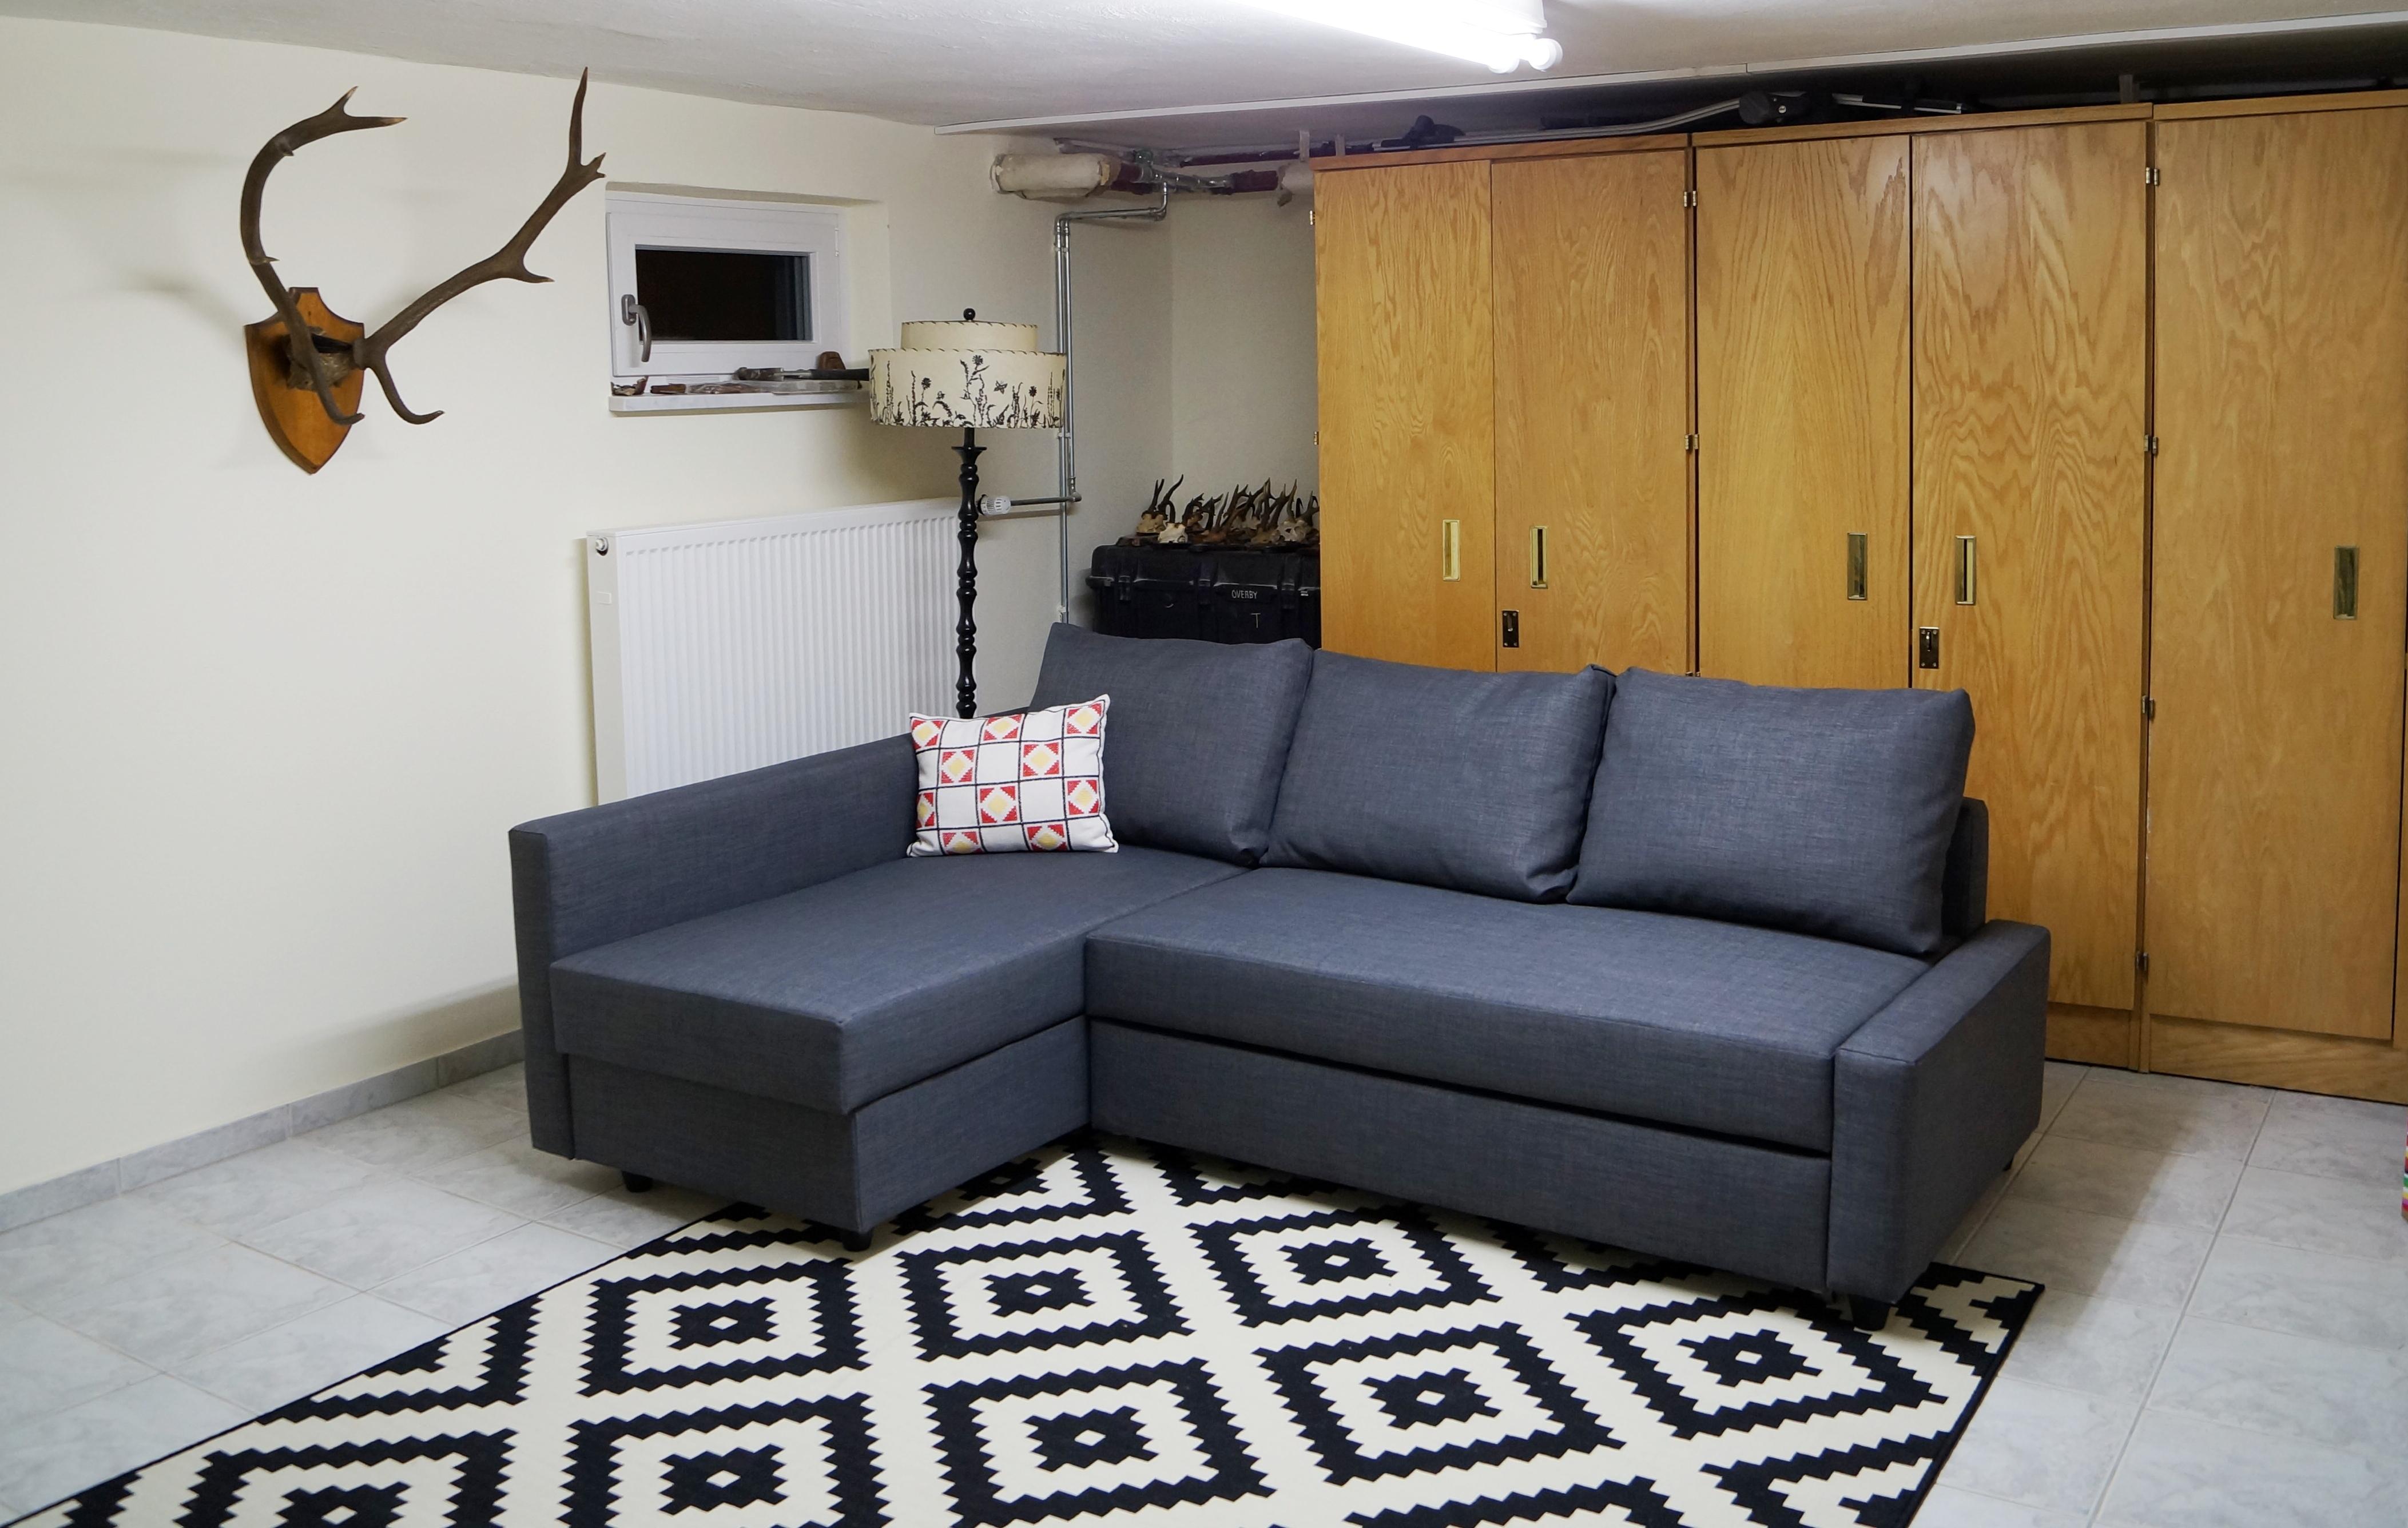 friheten ikea sofa bed review. Black Bedroom Furniture Sets. Home Design Ideas